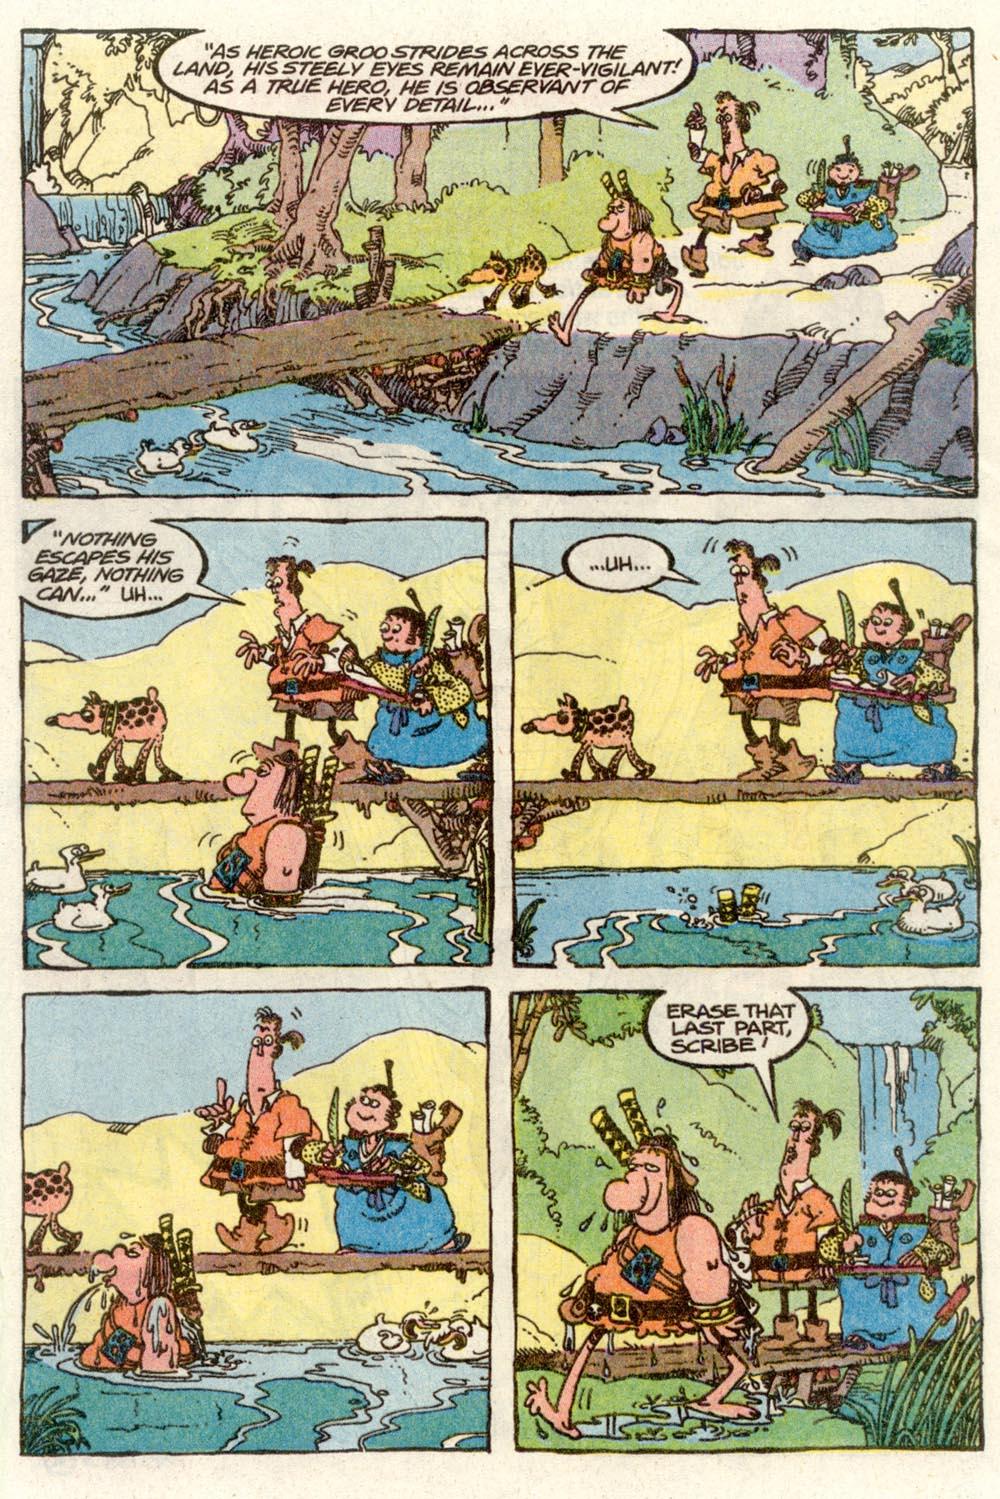 Read online Sergio Aragonés Groo the Wanderer comic -  Issue #70 - 9